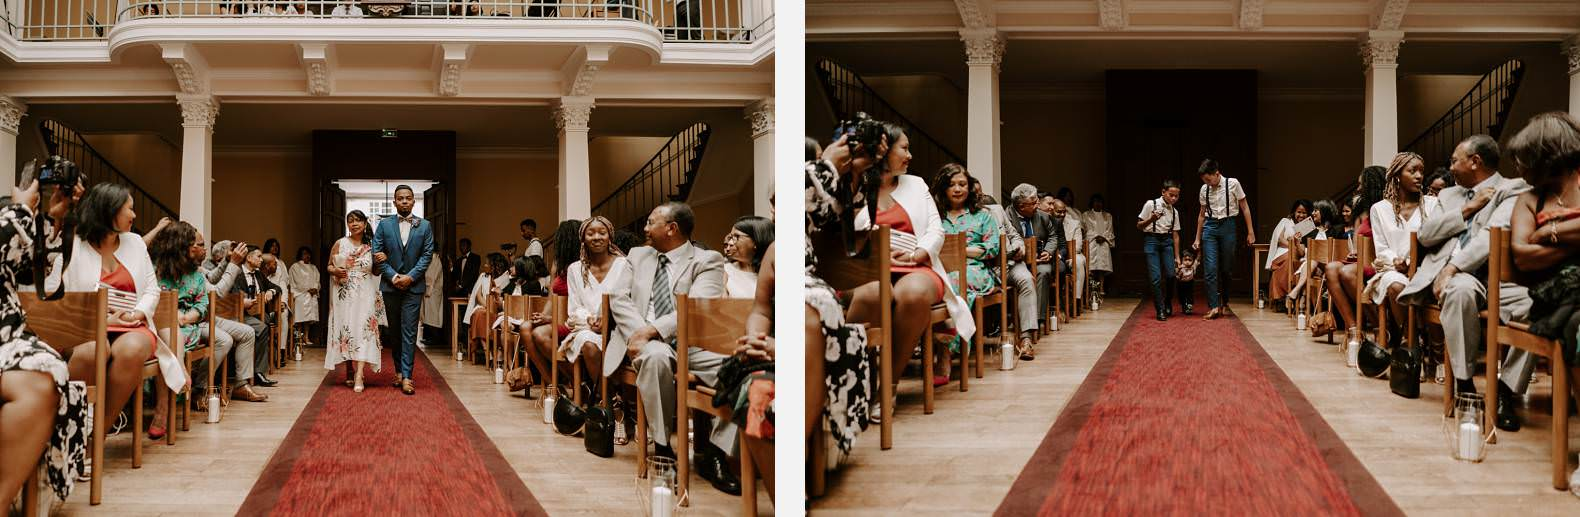 mariage manoir de corny photographe bel esprit 0018 1